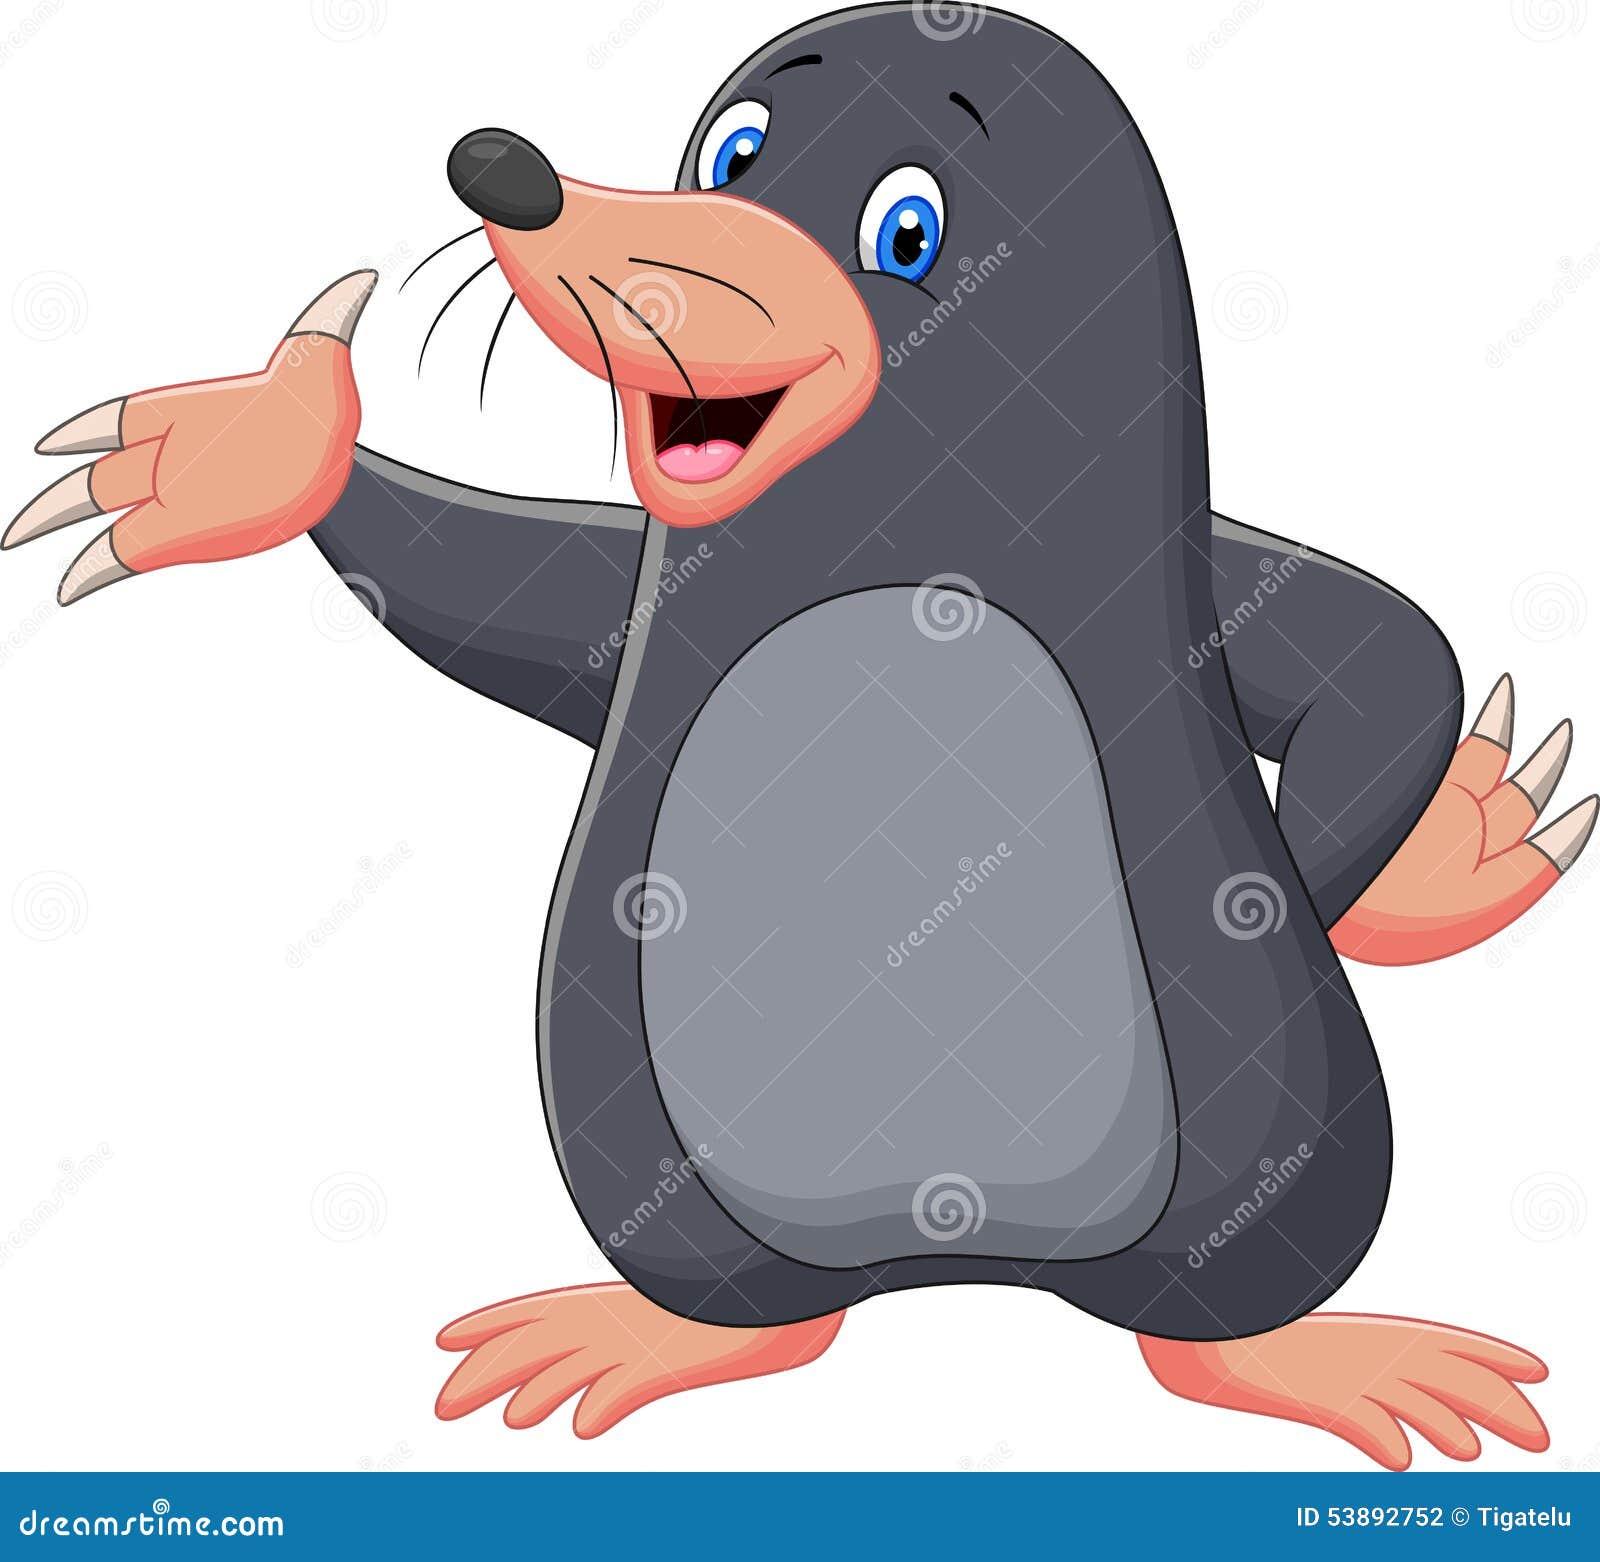 Cartoon Mole Waving Stock Vector - Image: 53892752